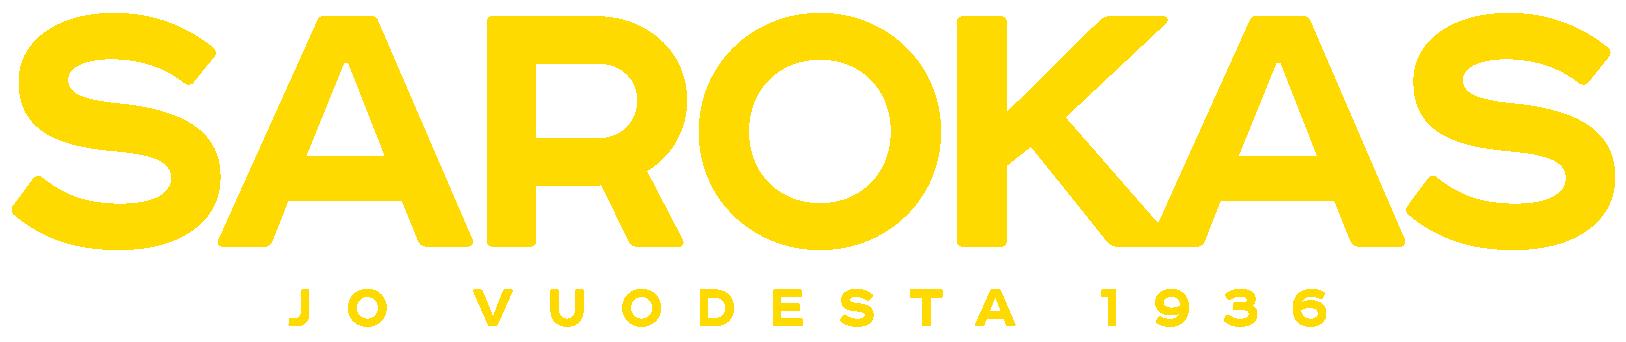 Rakentajan Sarokas Oy logo